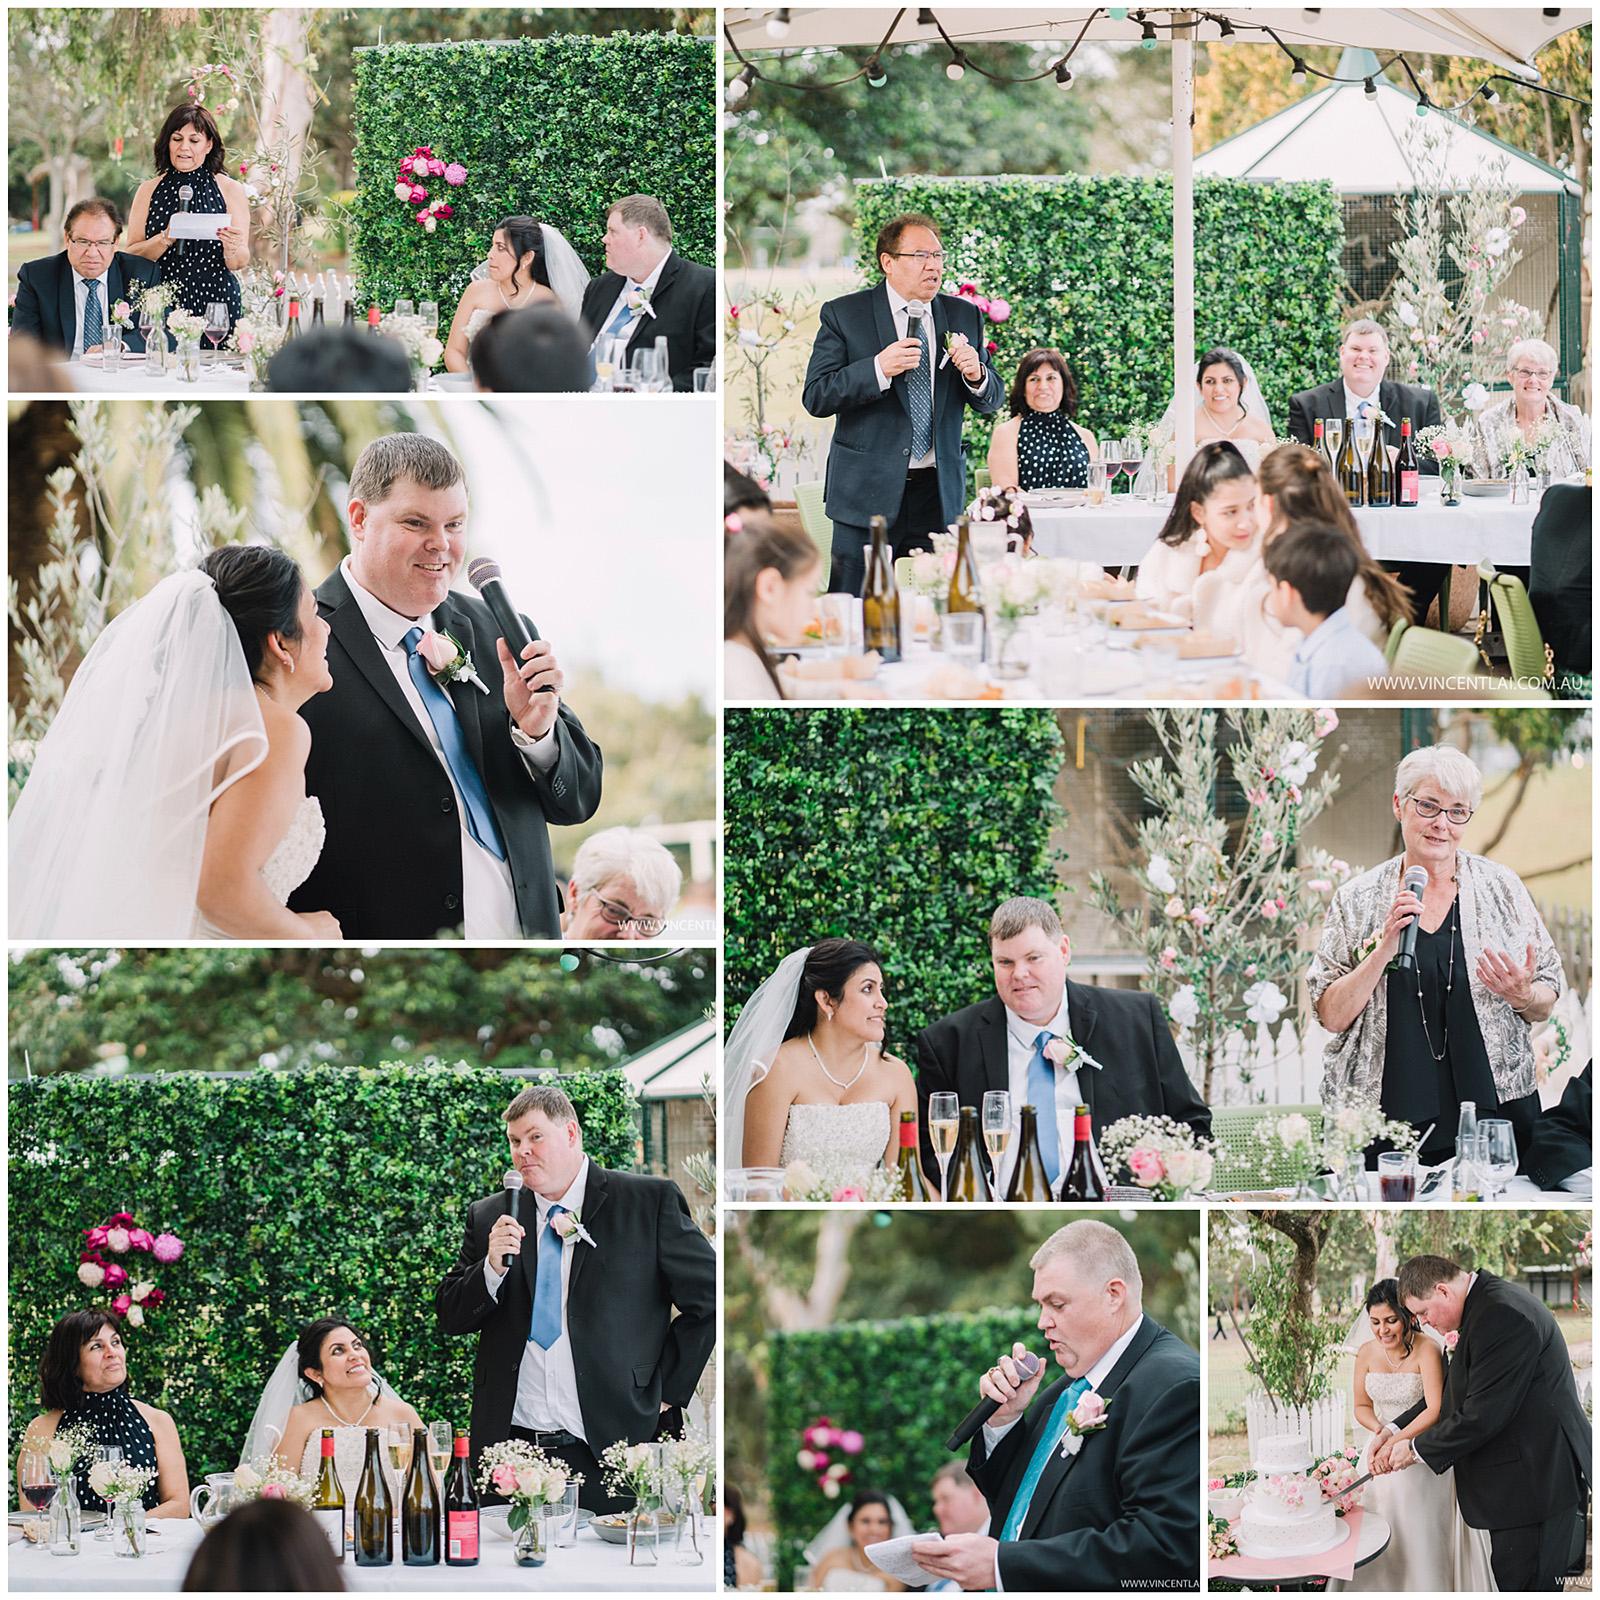 Wedding at The Greens North Sydney